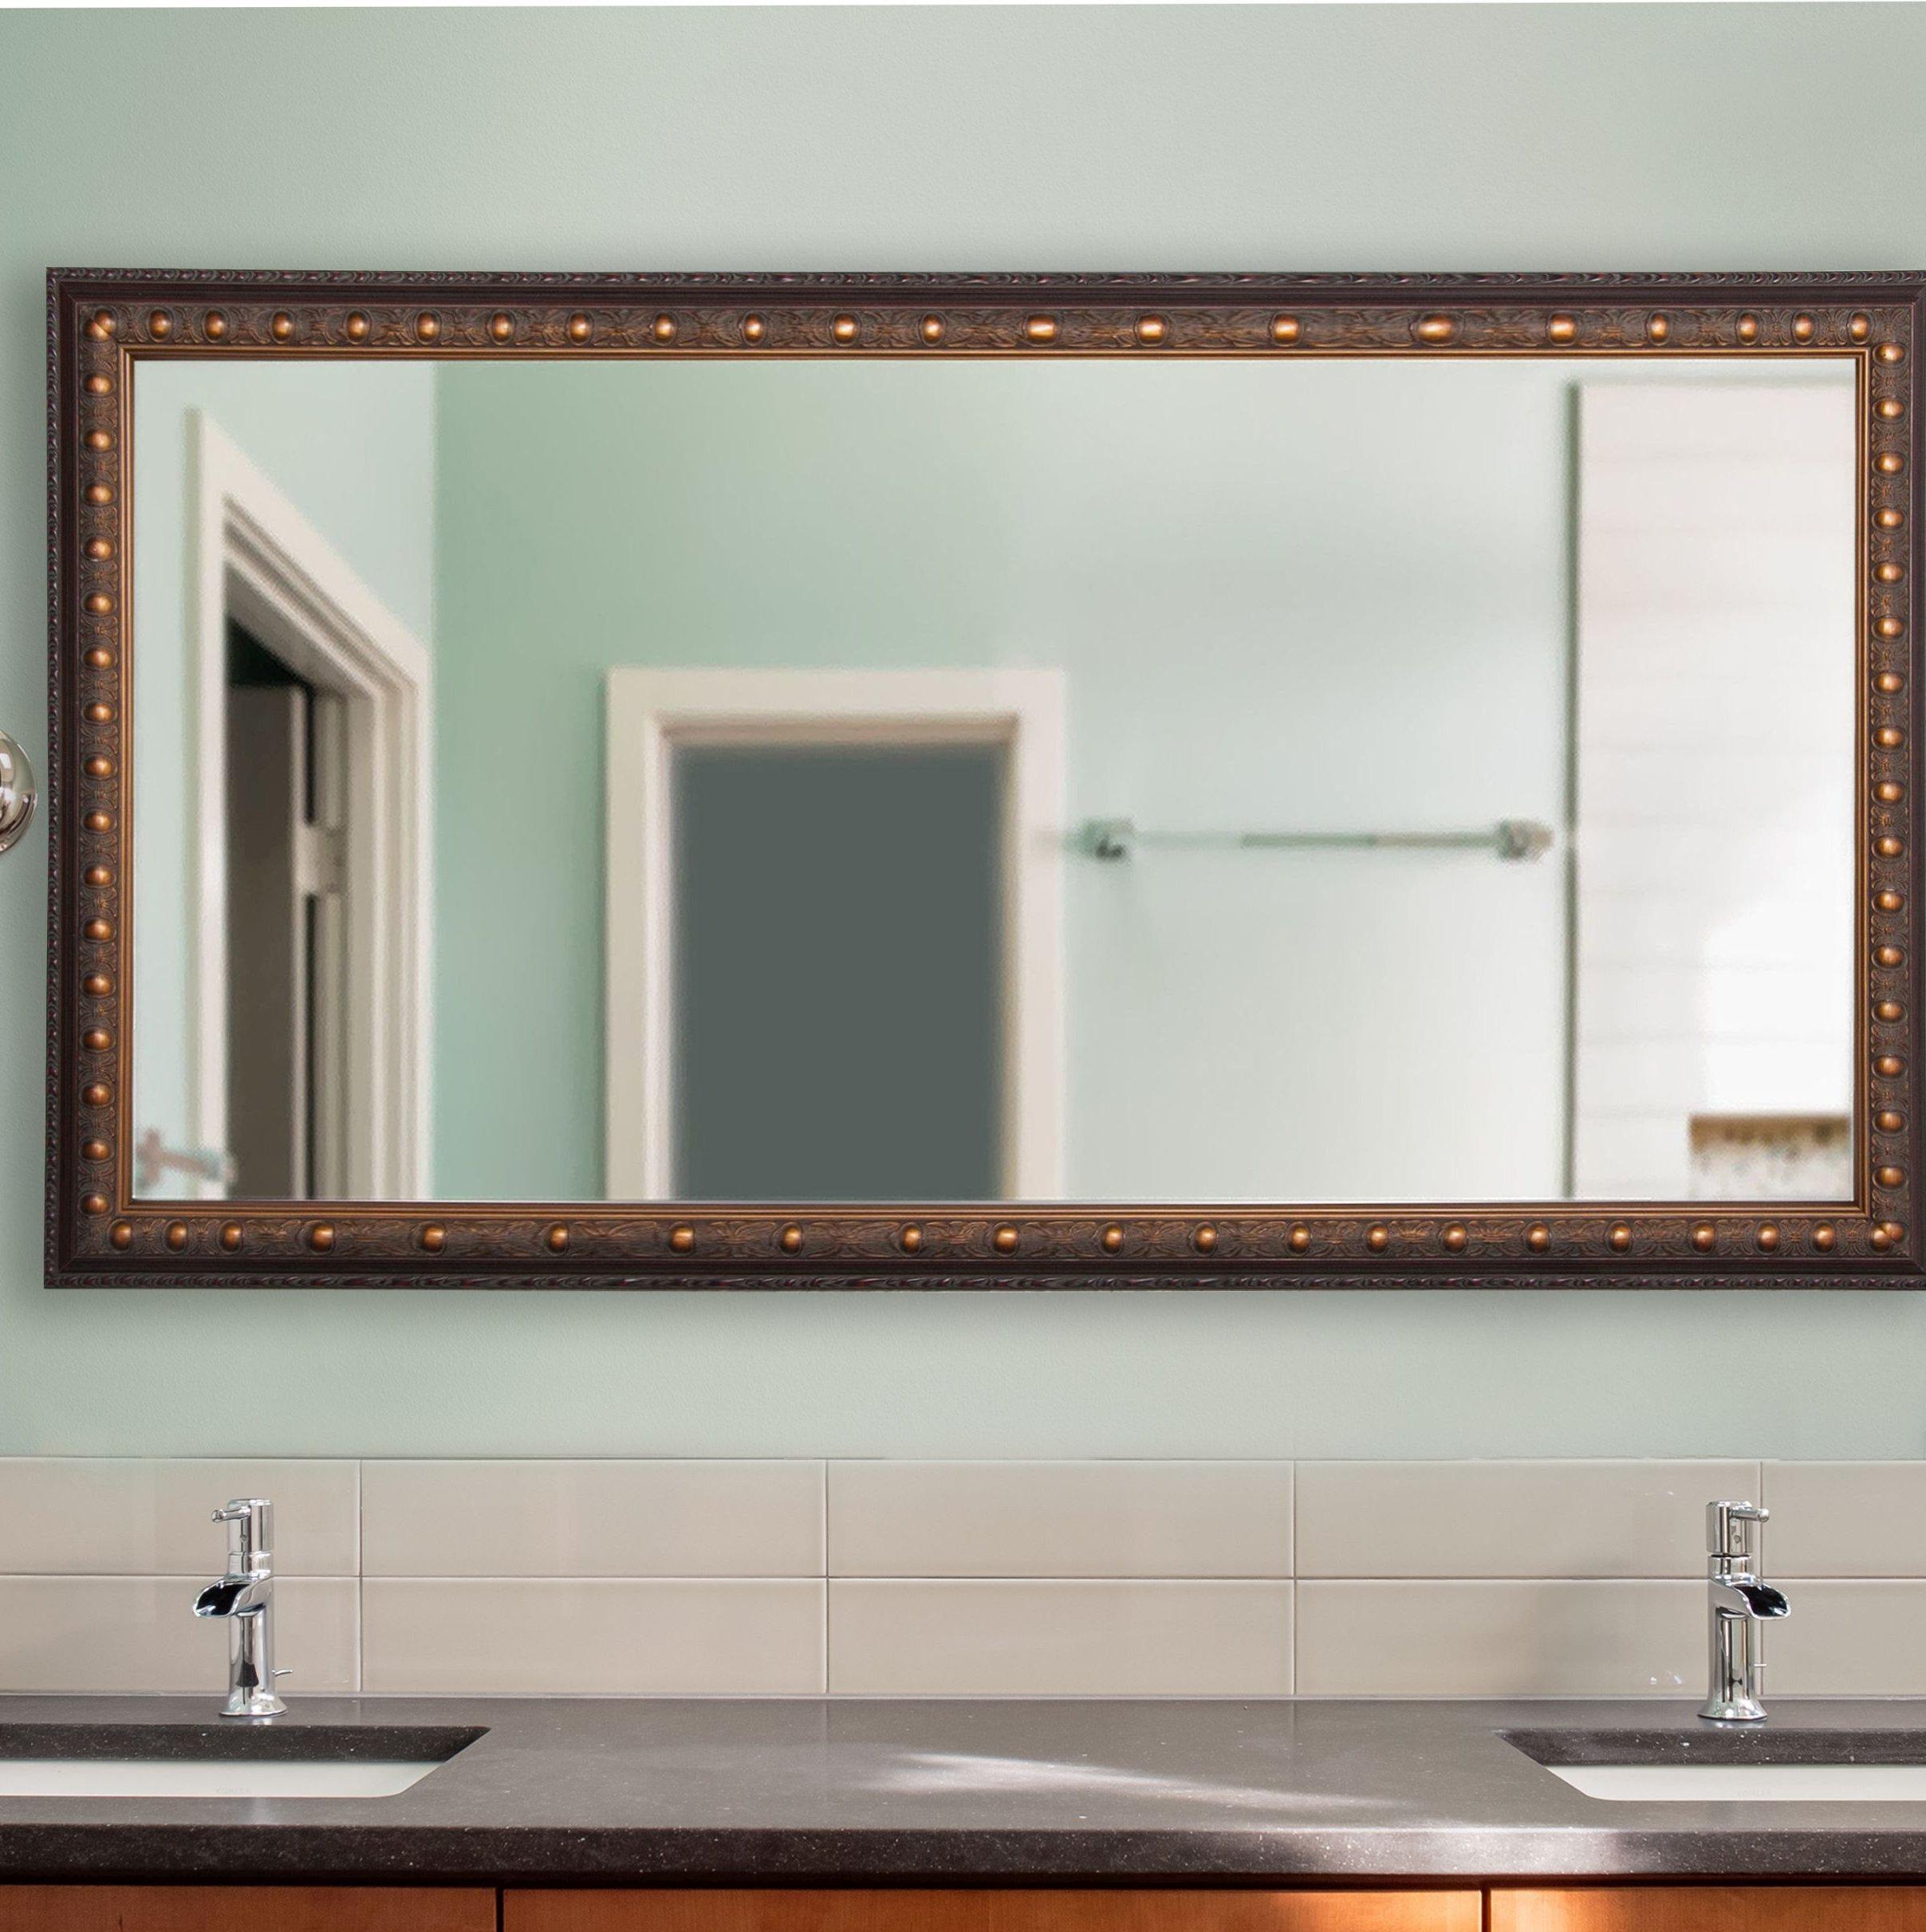 Weinstock Bathroom/vanity Mirror Pertaining To Kristy Rectangular Beveled Vanity Mirrors In Distressed (View 5 of 20)